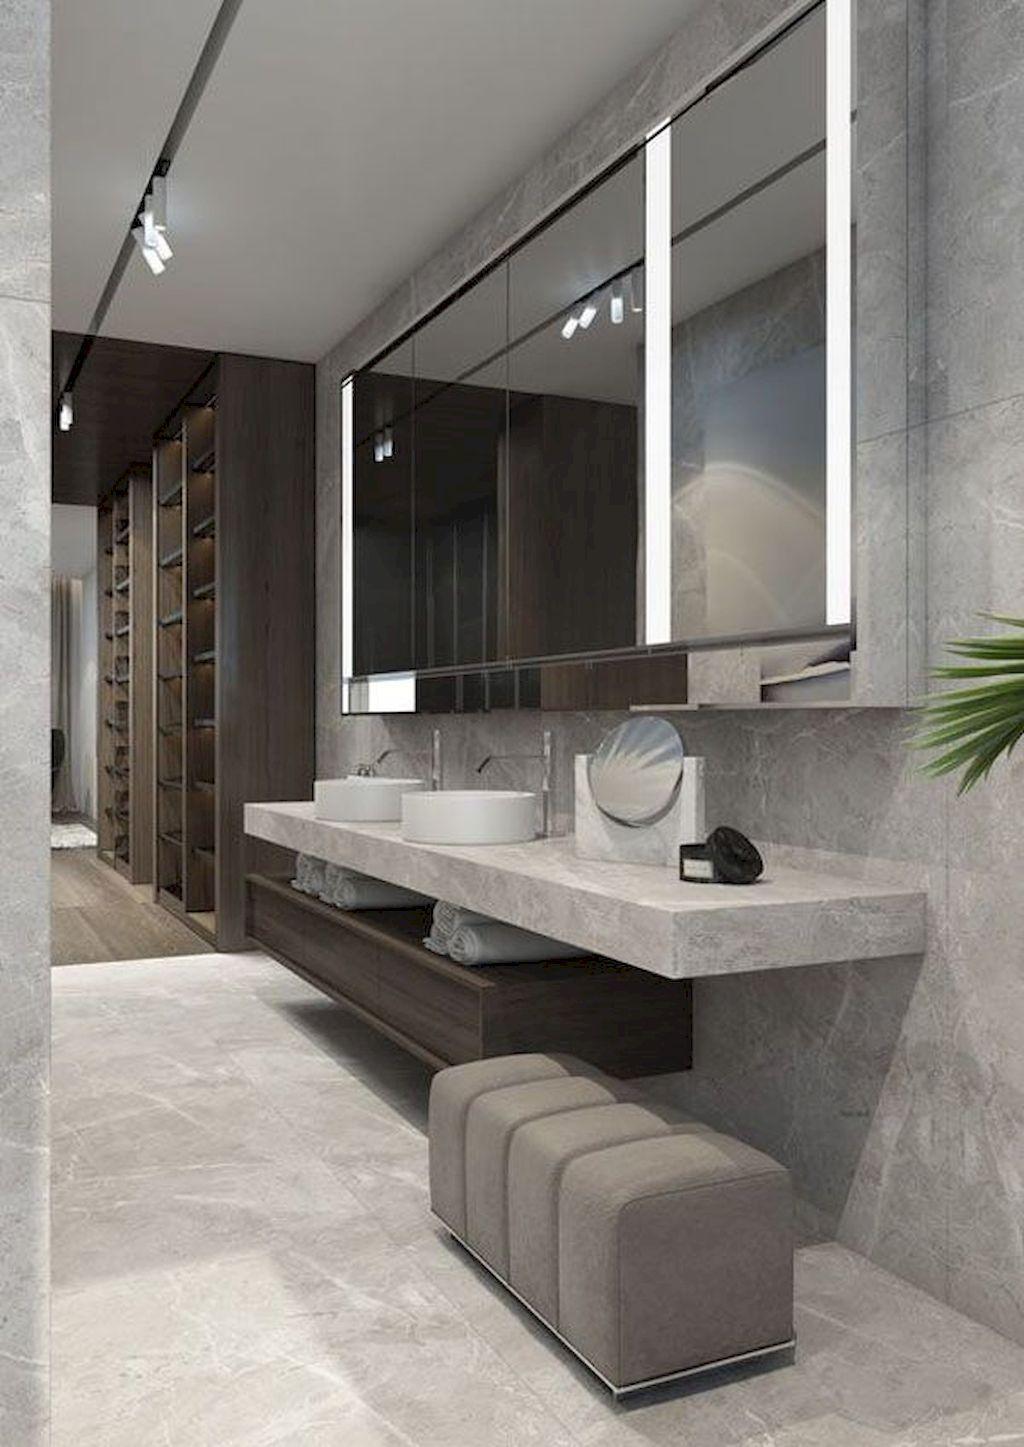 Bathroom Glamor 215 Bathroom Inspiration Modern Modern Bathroom Design Bathroom Interior Design